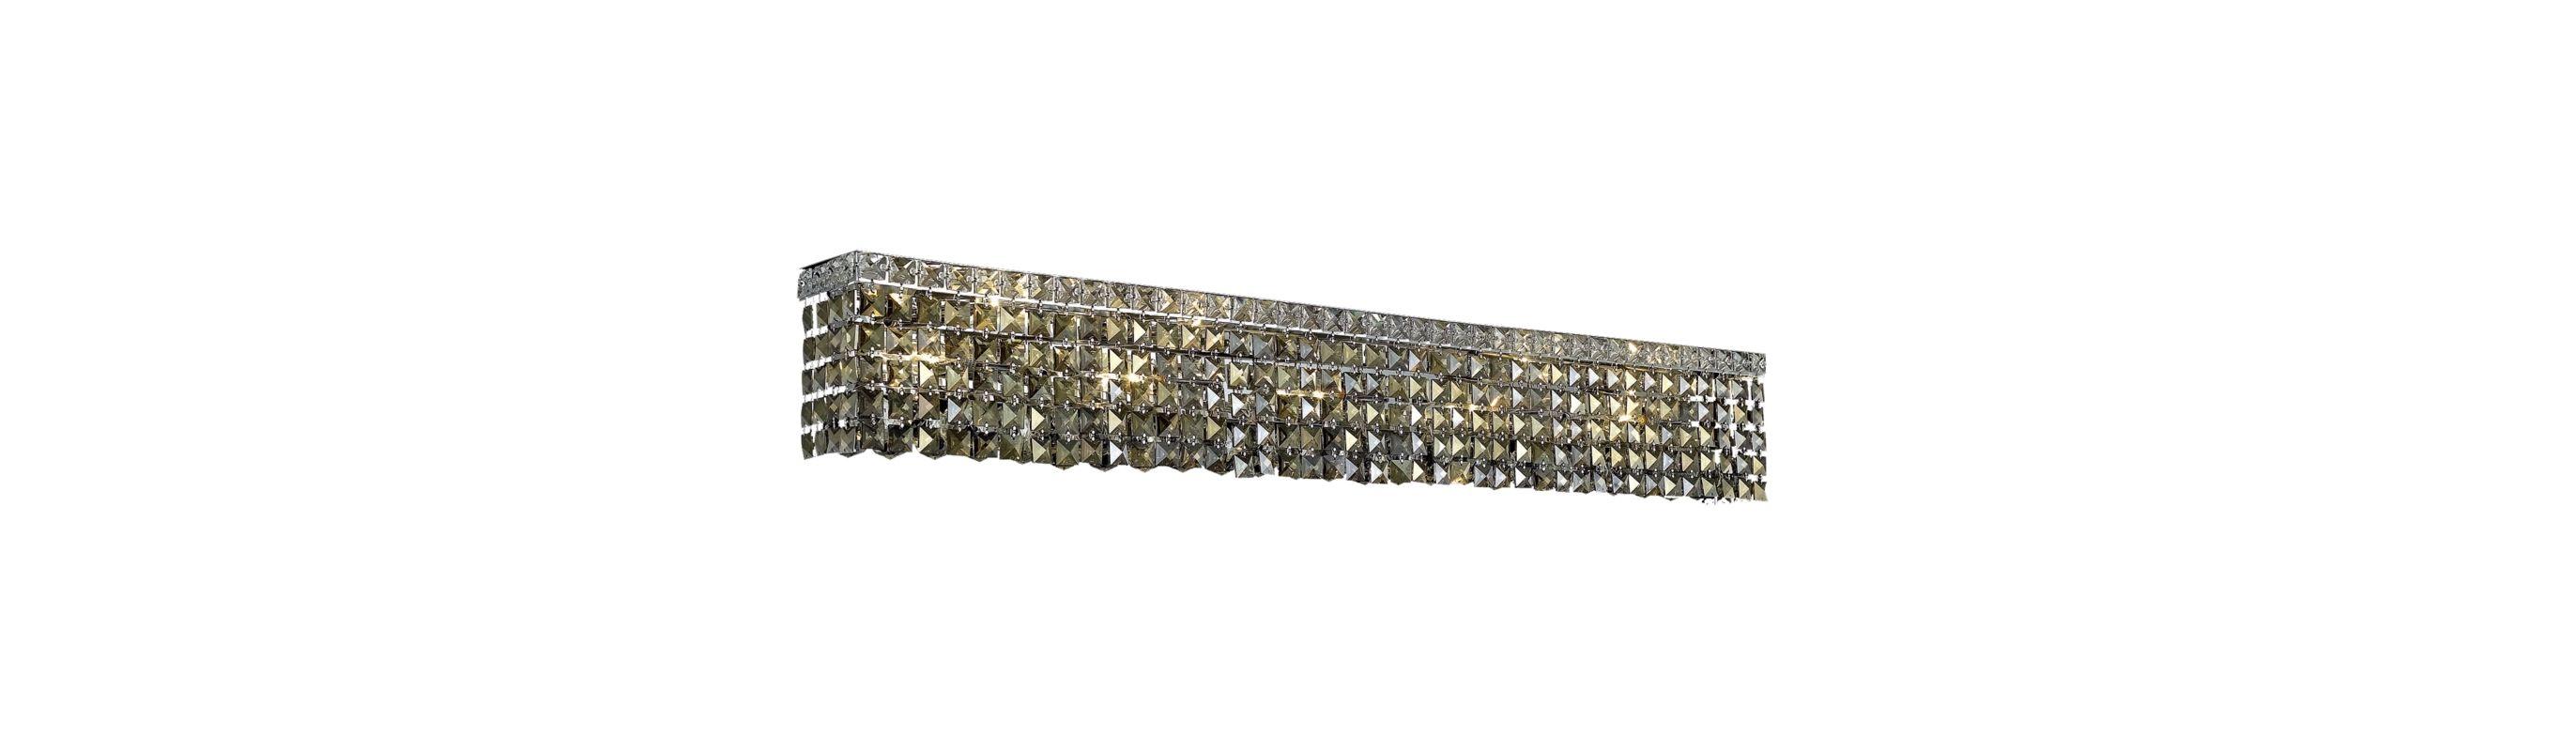 Elegant Lighting 2033W44C-GT Maxim 10-Light Crystal Wall Sconce